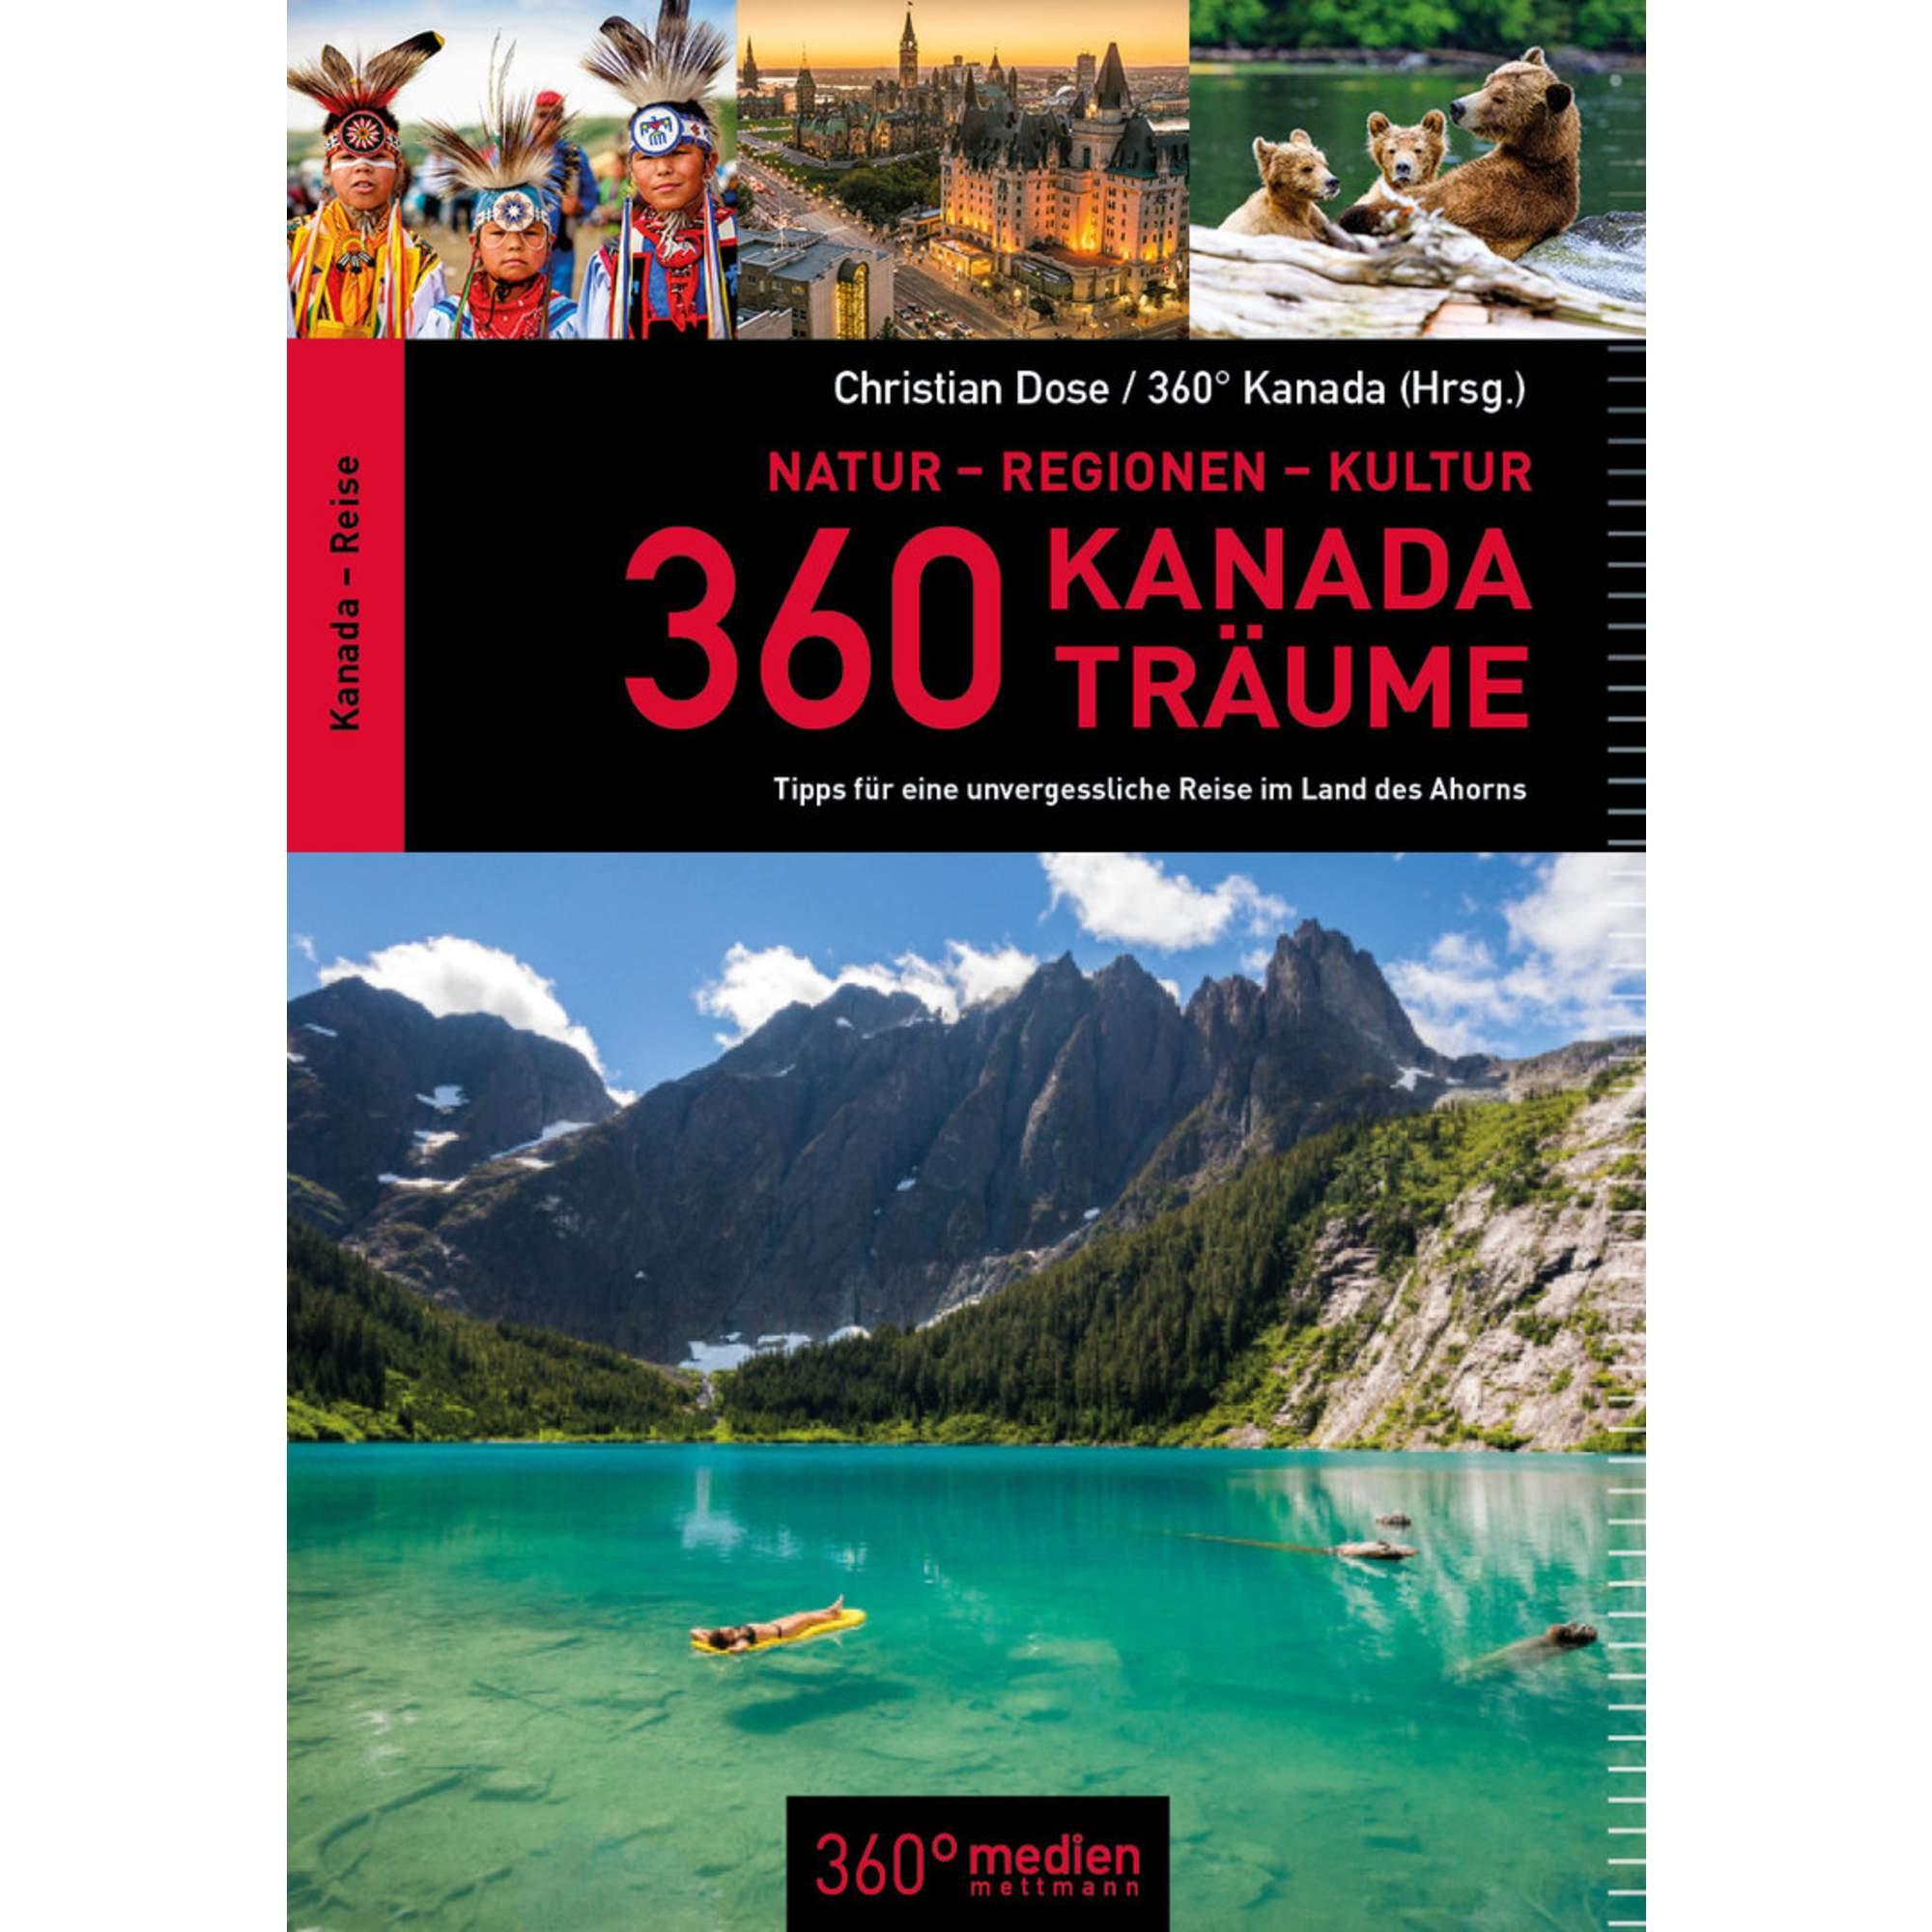 360 KANADA-TRÄUME, 24,95 Euro